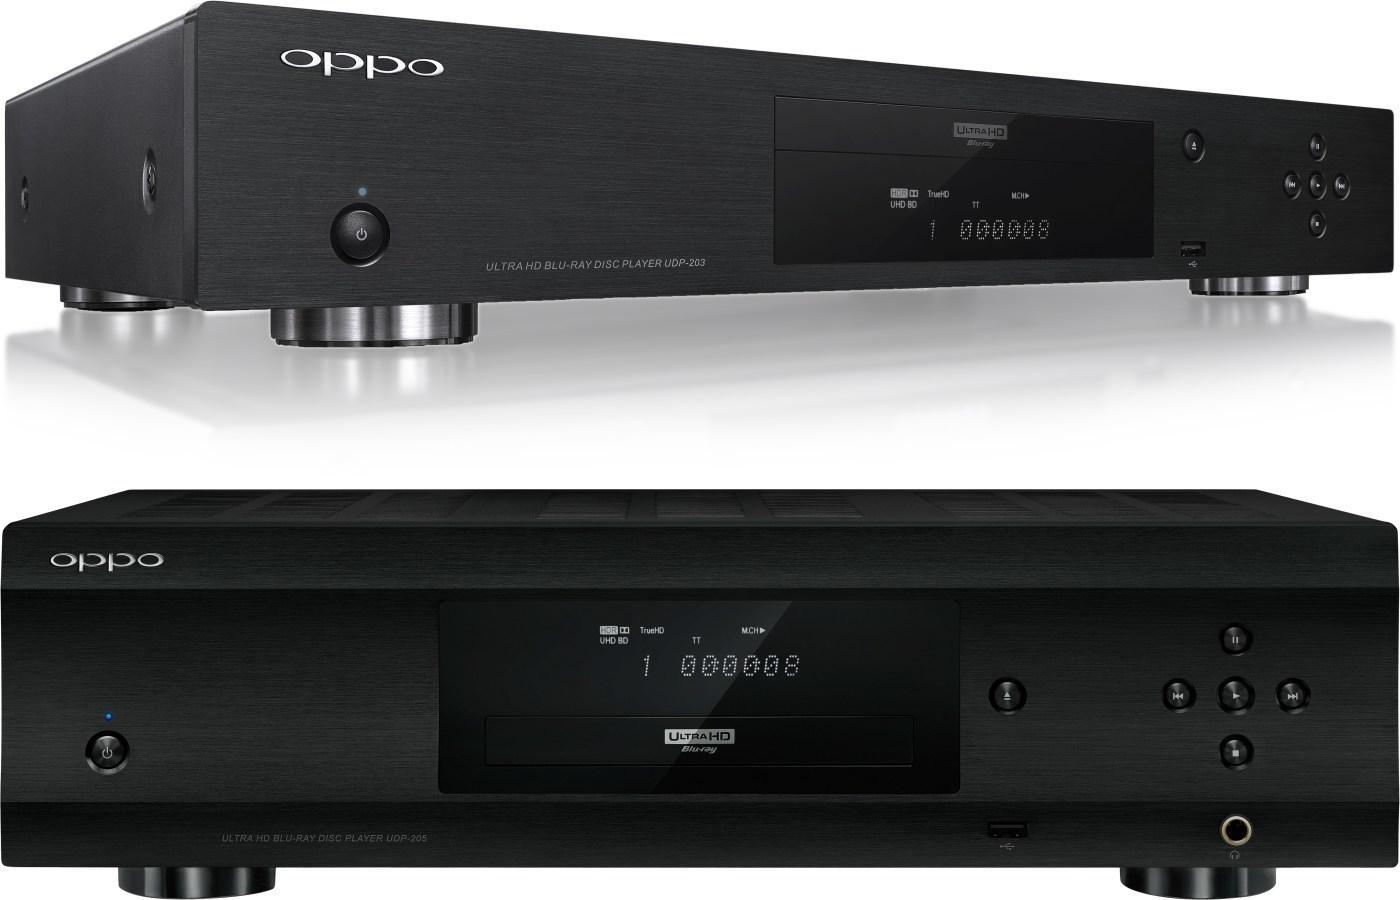 OPPO宣布蓝光播放器、耳机以及音频系统都将停产